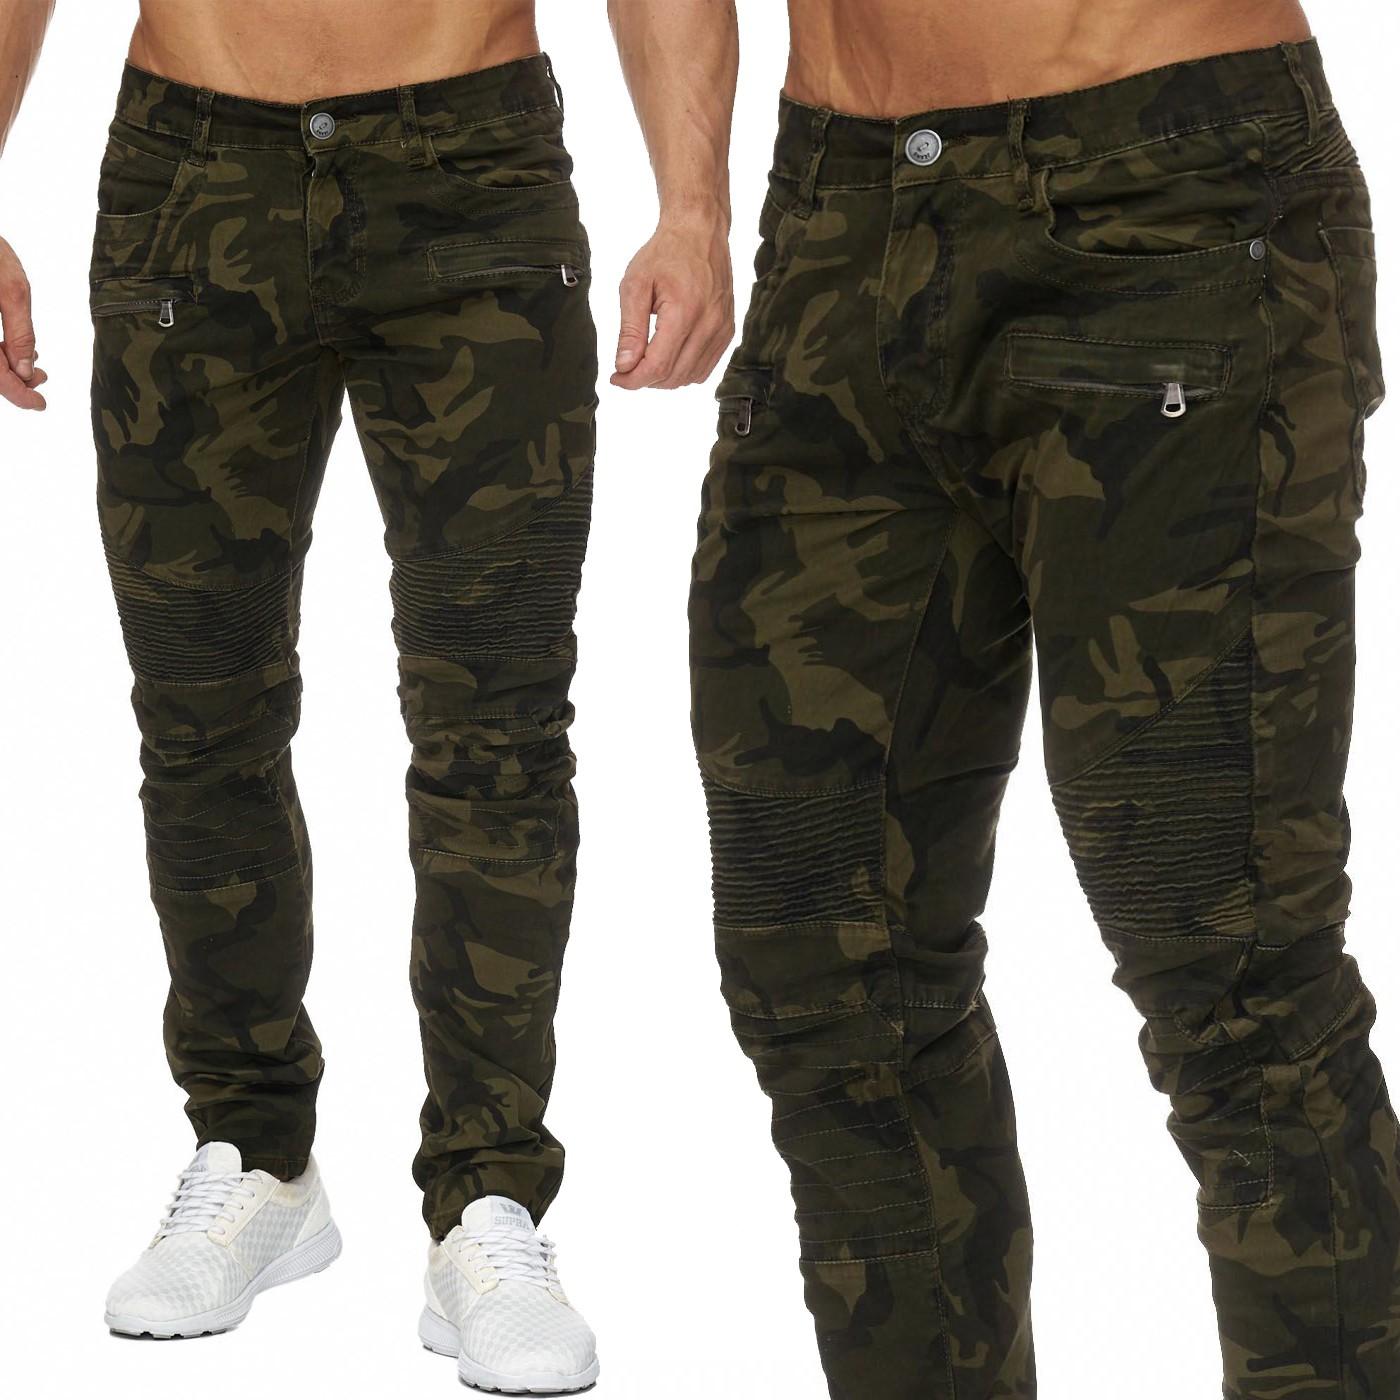 herren hose camouflage biker jeans tarnmuster zipper. Black Bedroom Furniture Sets. Home Design Ideas